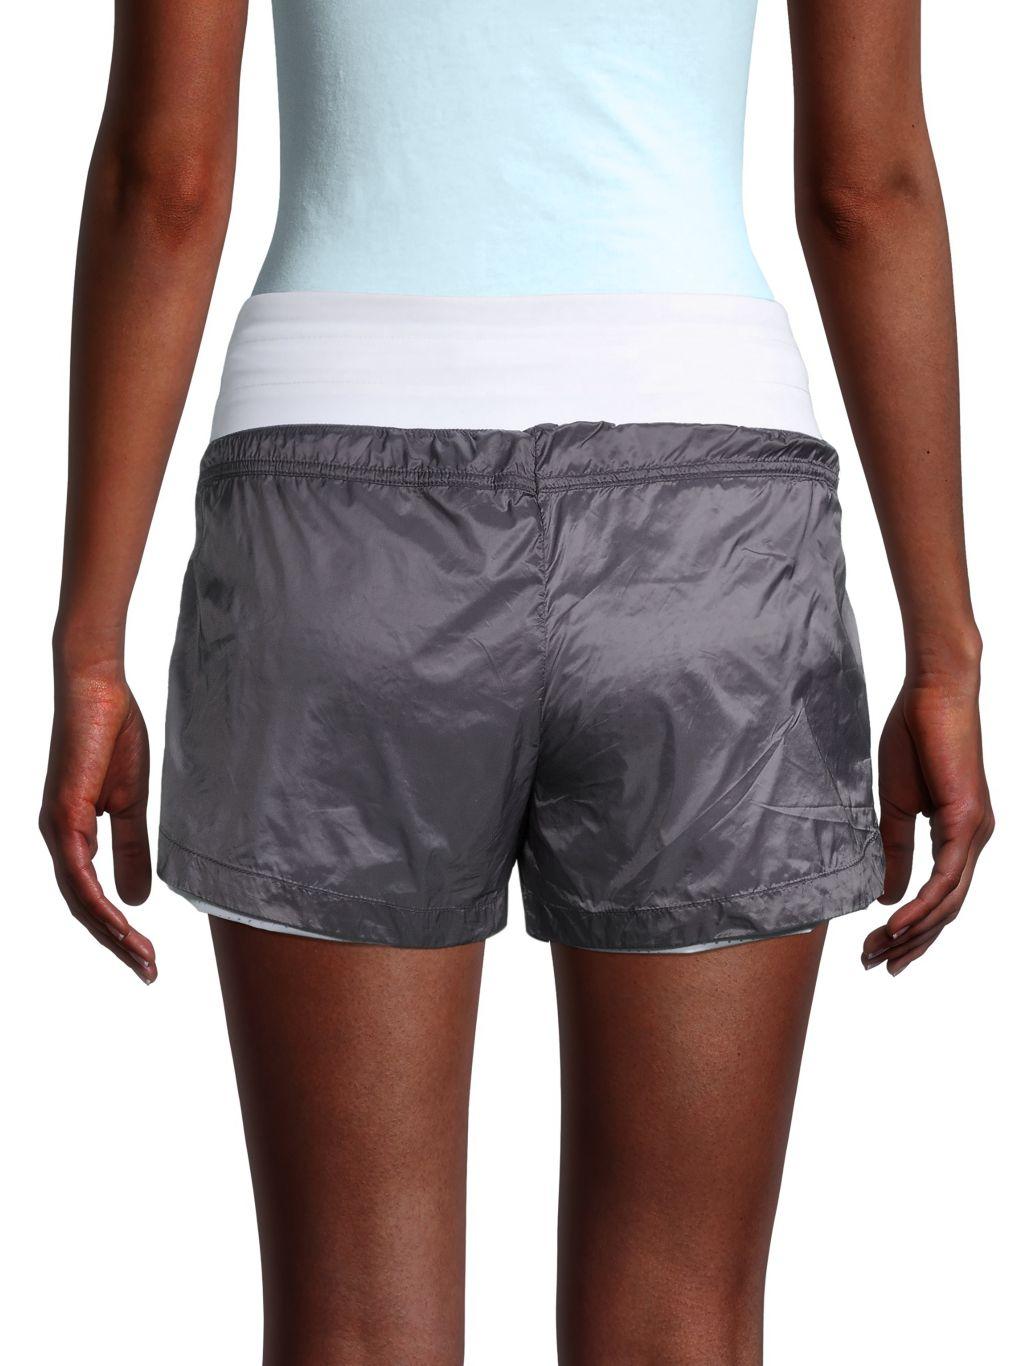 Blanc Noir Drawstrings Shorts